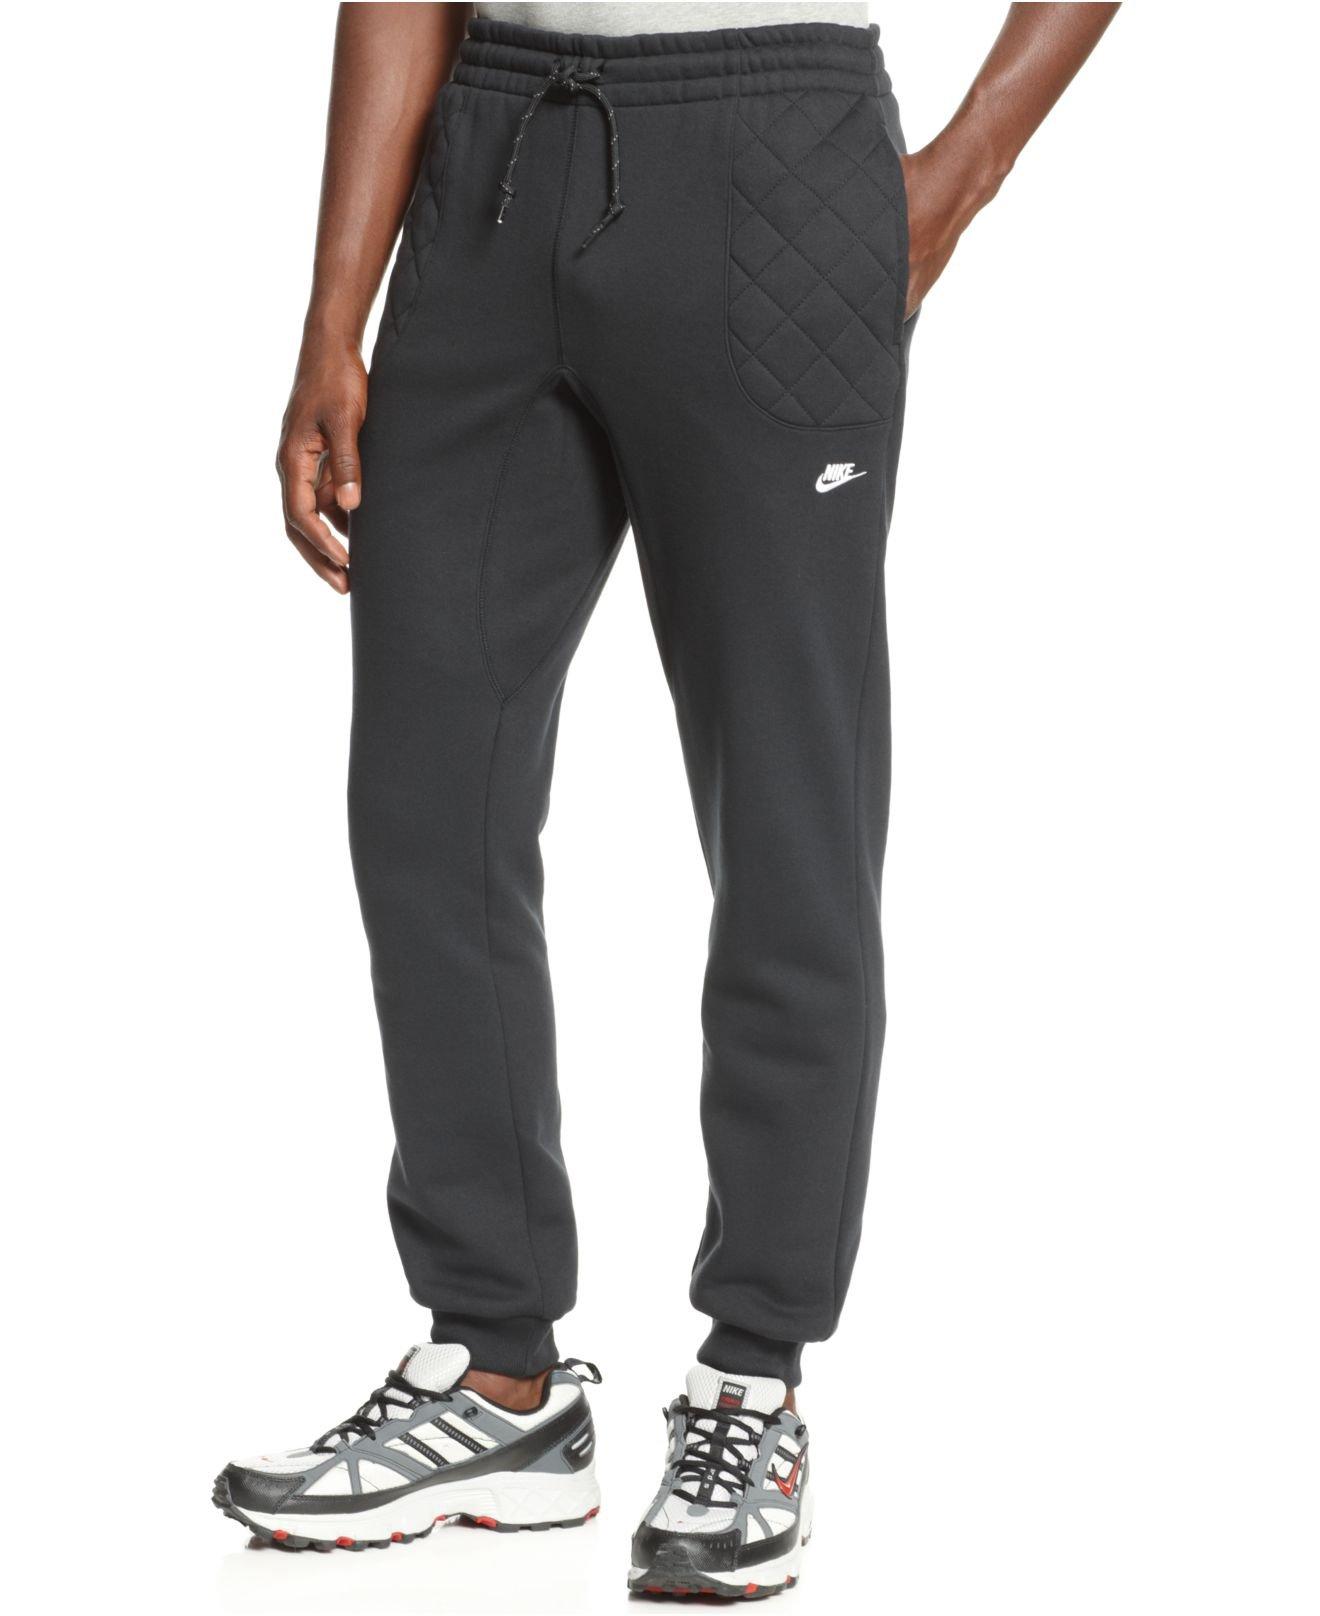 Perfect Pants Nike Joggers Grey Sweatpants Black Casual Shoes